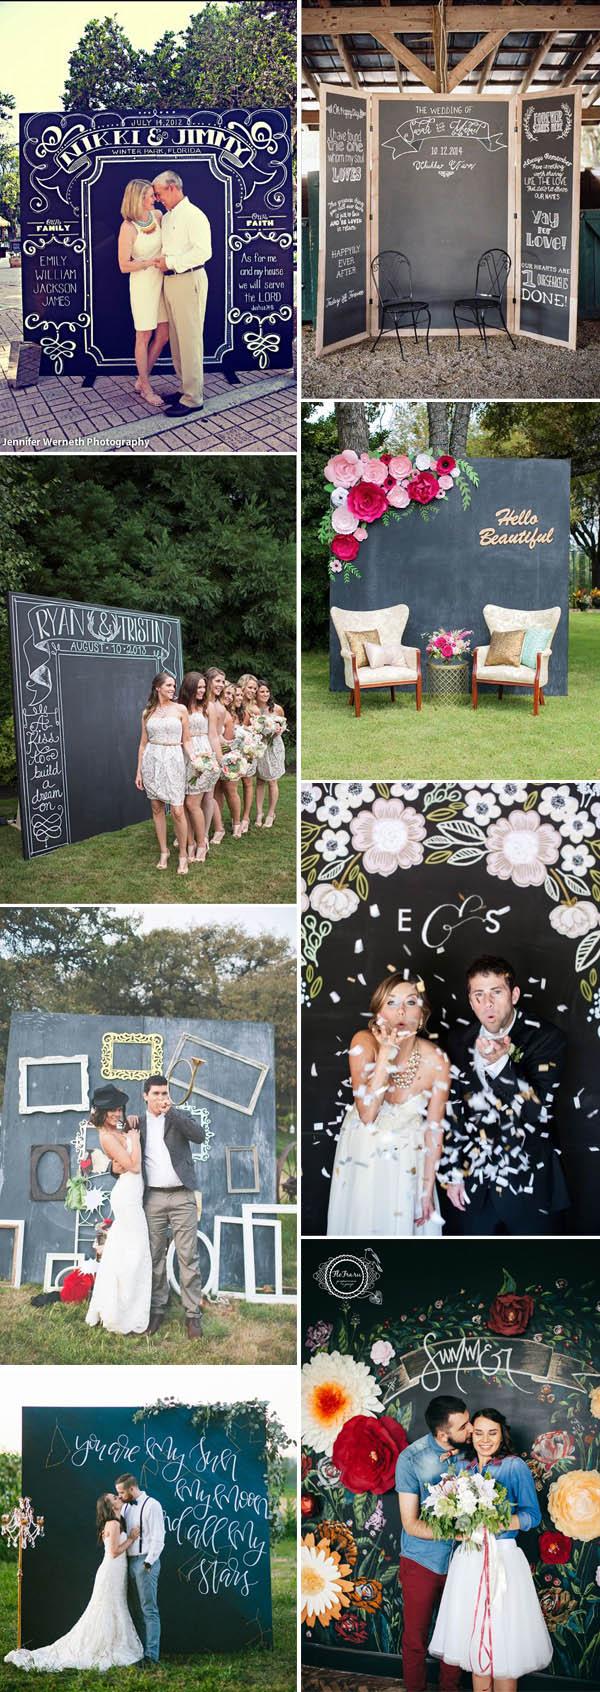 Diy Wedding Photobooth 40 Stealworthy Chalkboard Wedding Ideas Elegantweddinginvites Blog